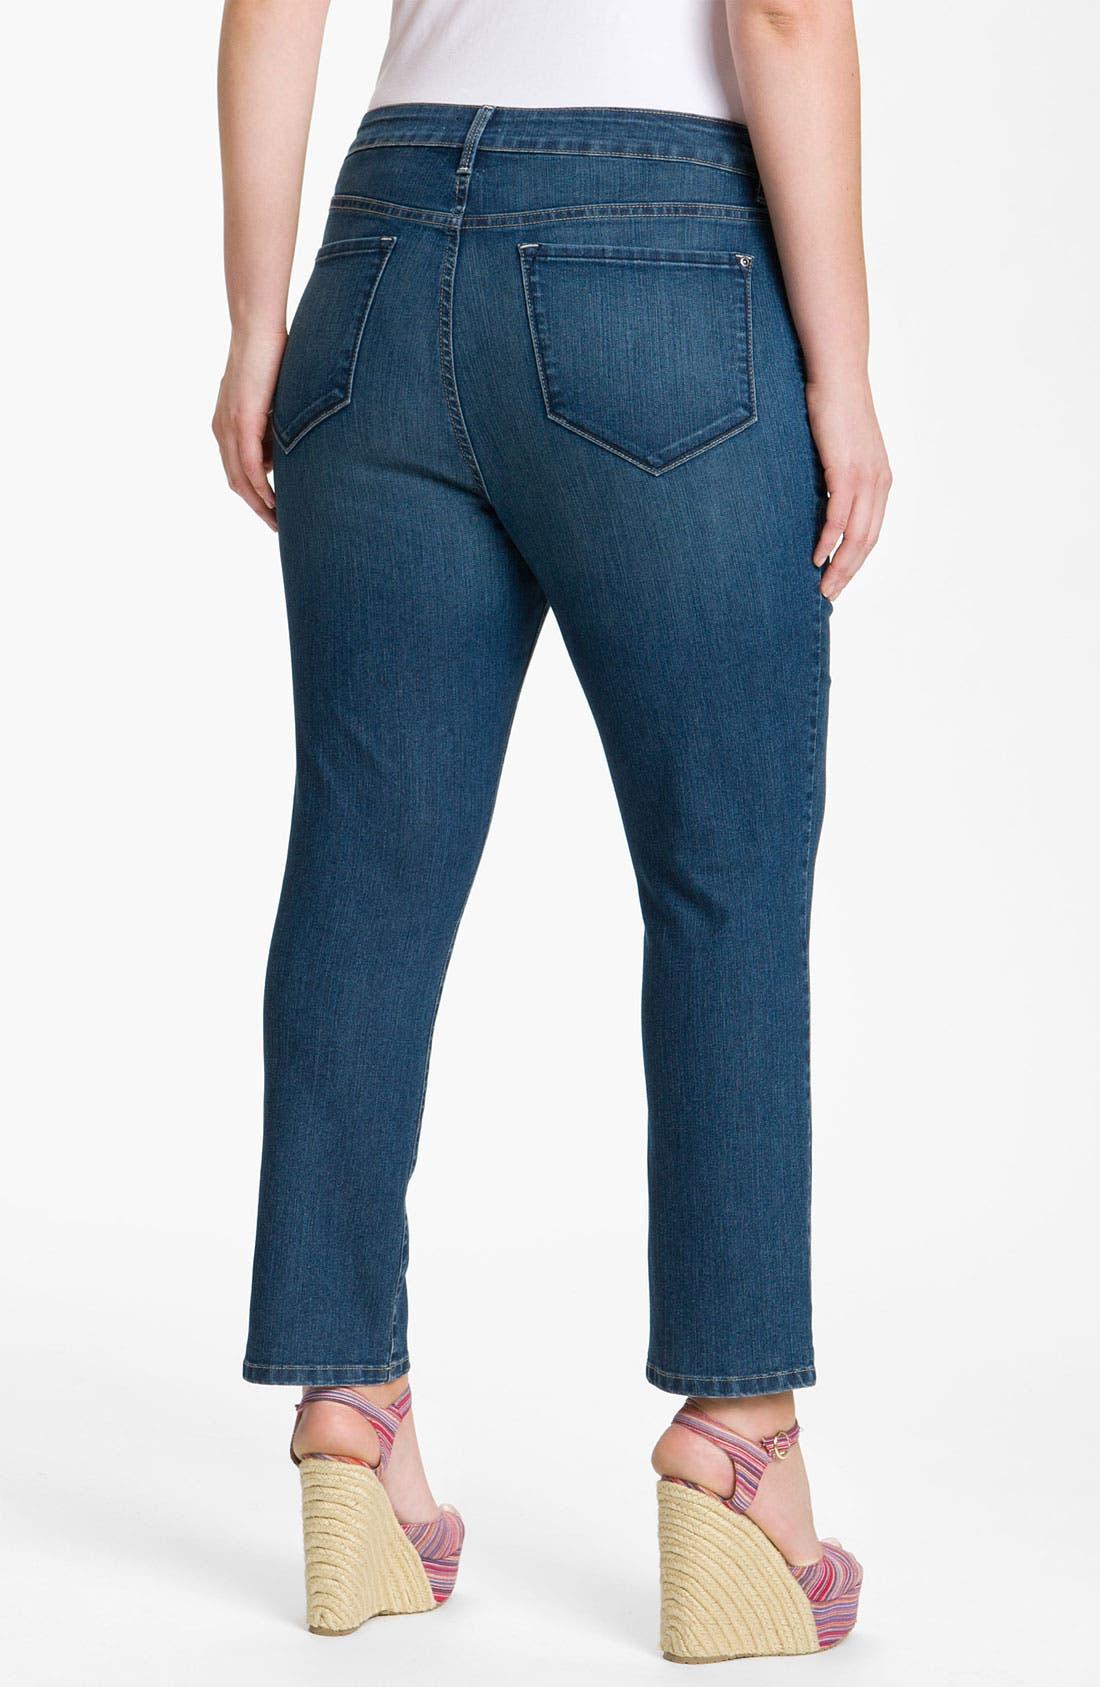 Main Image - NYDJ 'Cora' Ankle Jeans (Plus)